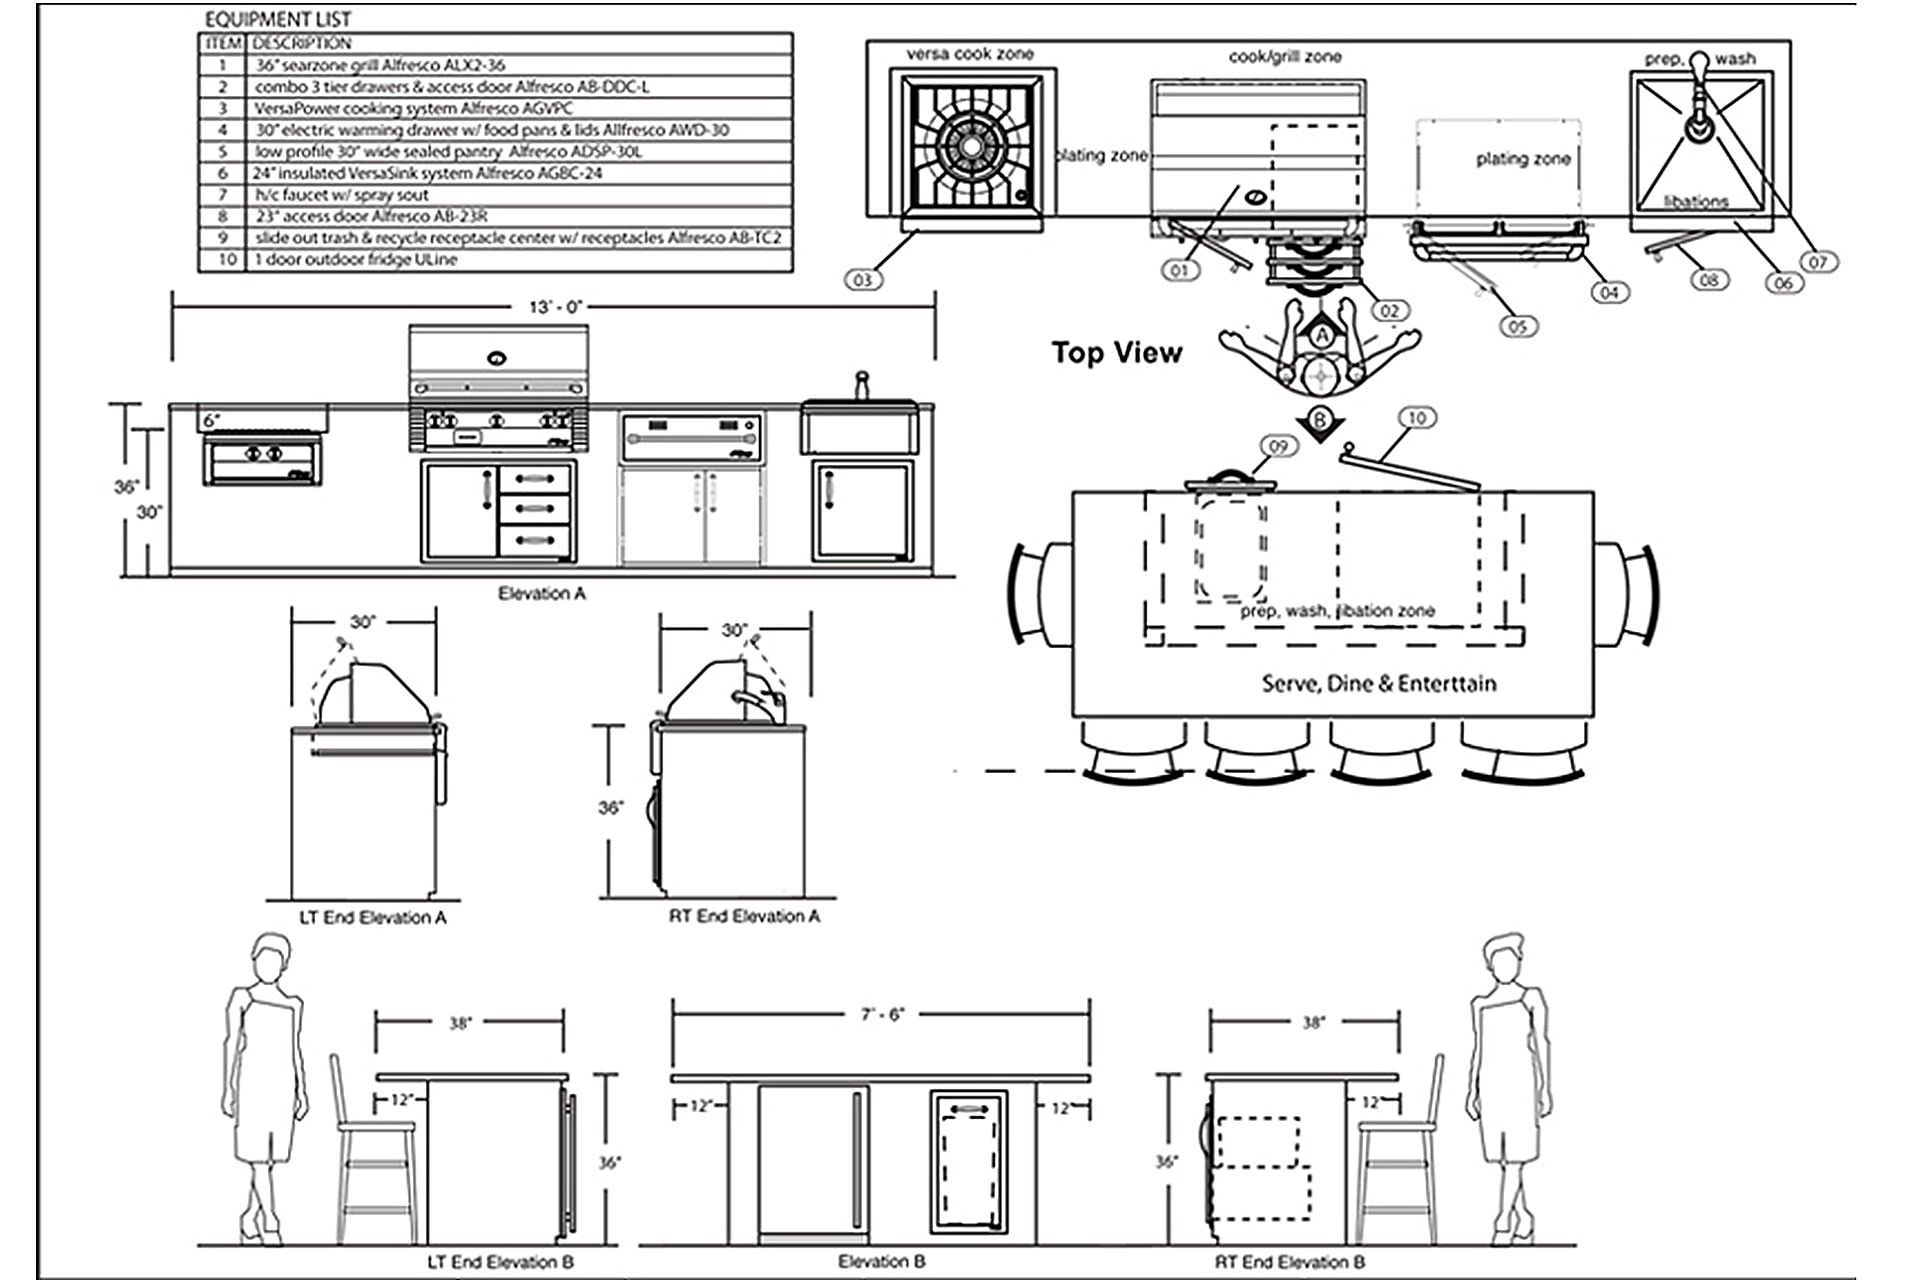 Outdoor Kitchen Plans Pdf Zitzat Com In 2019 Outdoor Kitchen Plans Kitchen Floor Plans Outdoor Kitchen Design